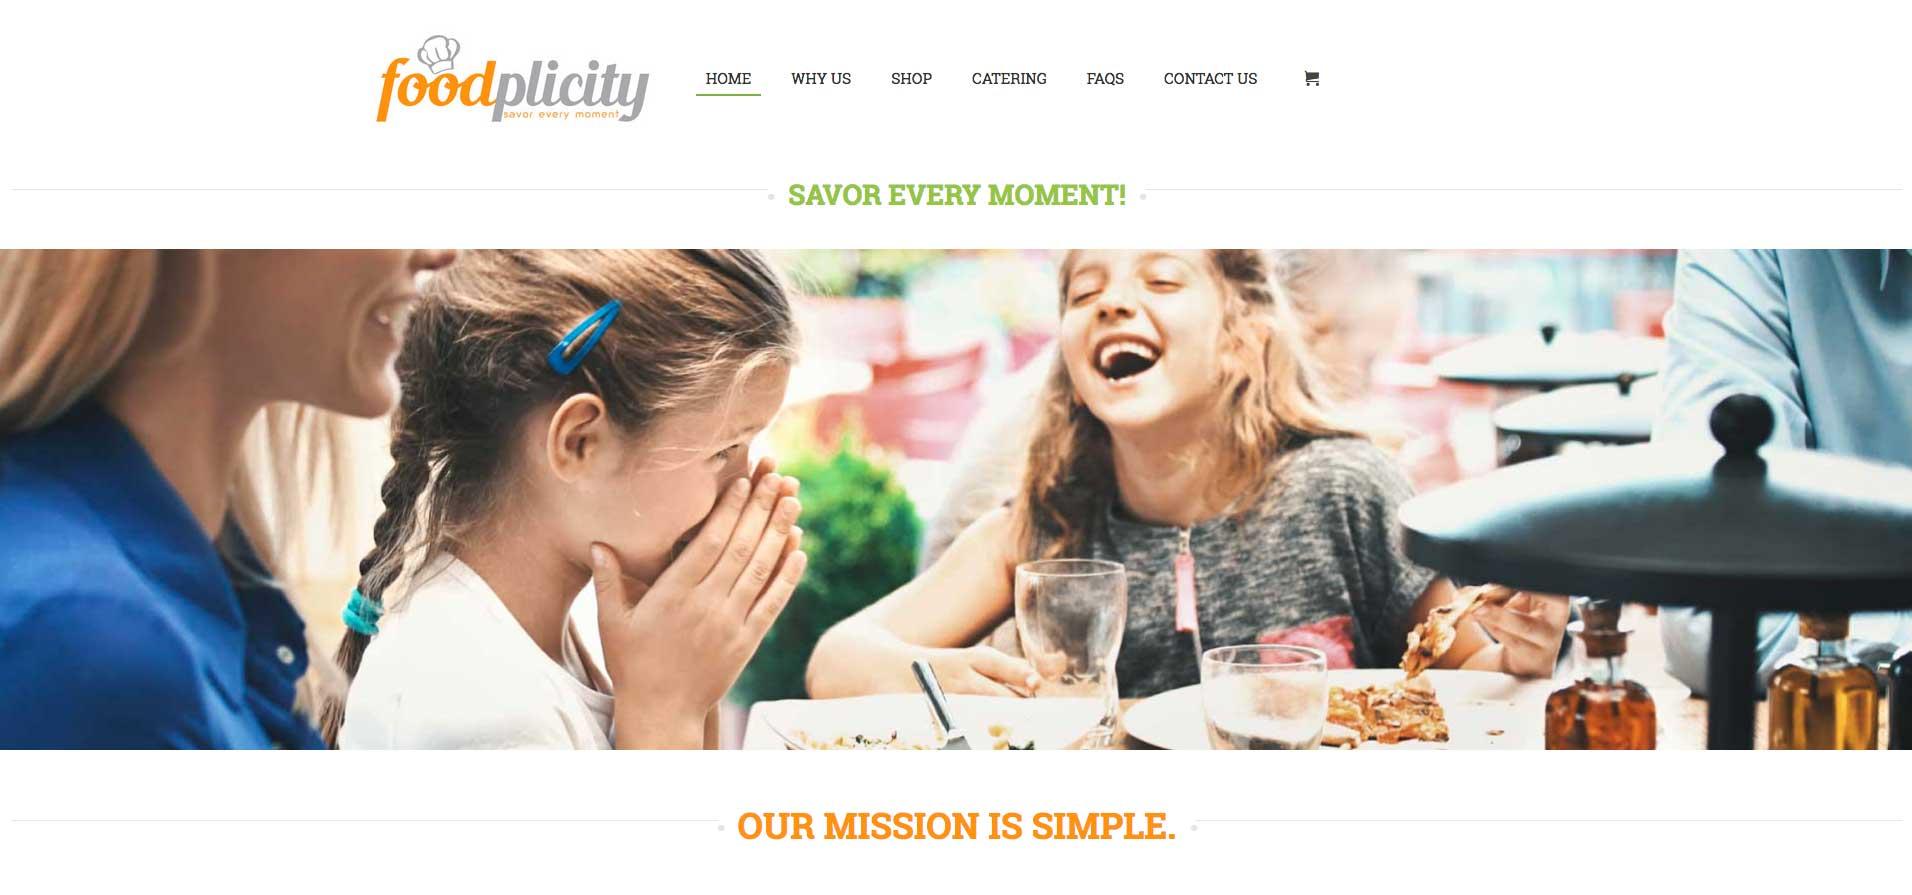 foodplicity website design